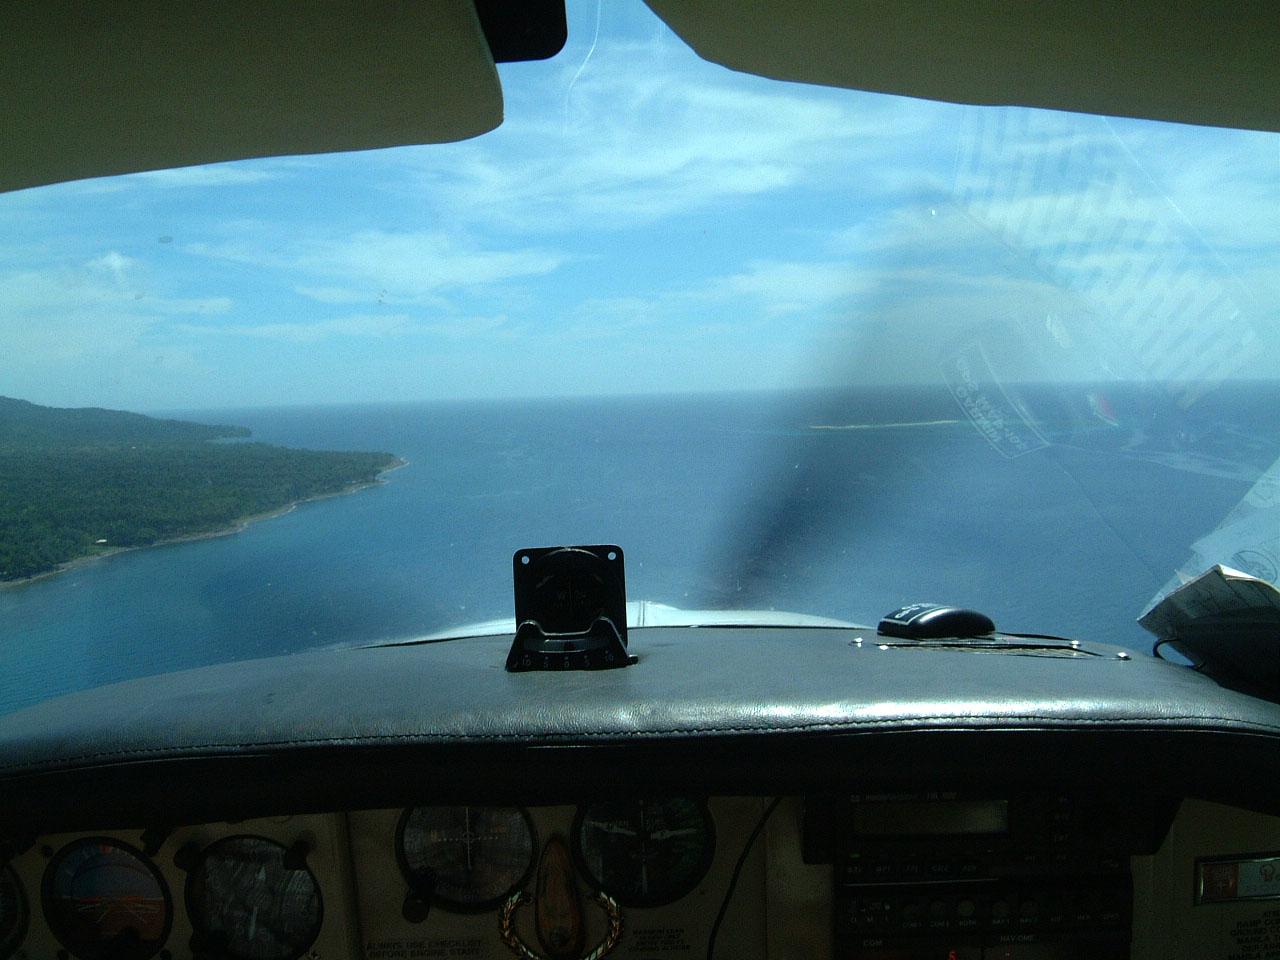 Philippines Chemtrad Manny Barradas overflying Camiguin Island Mar 2003 01